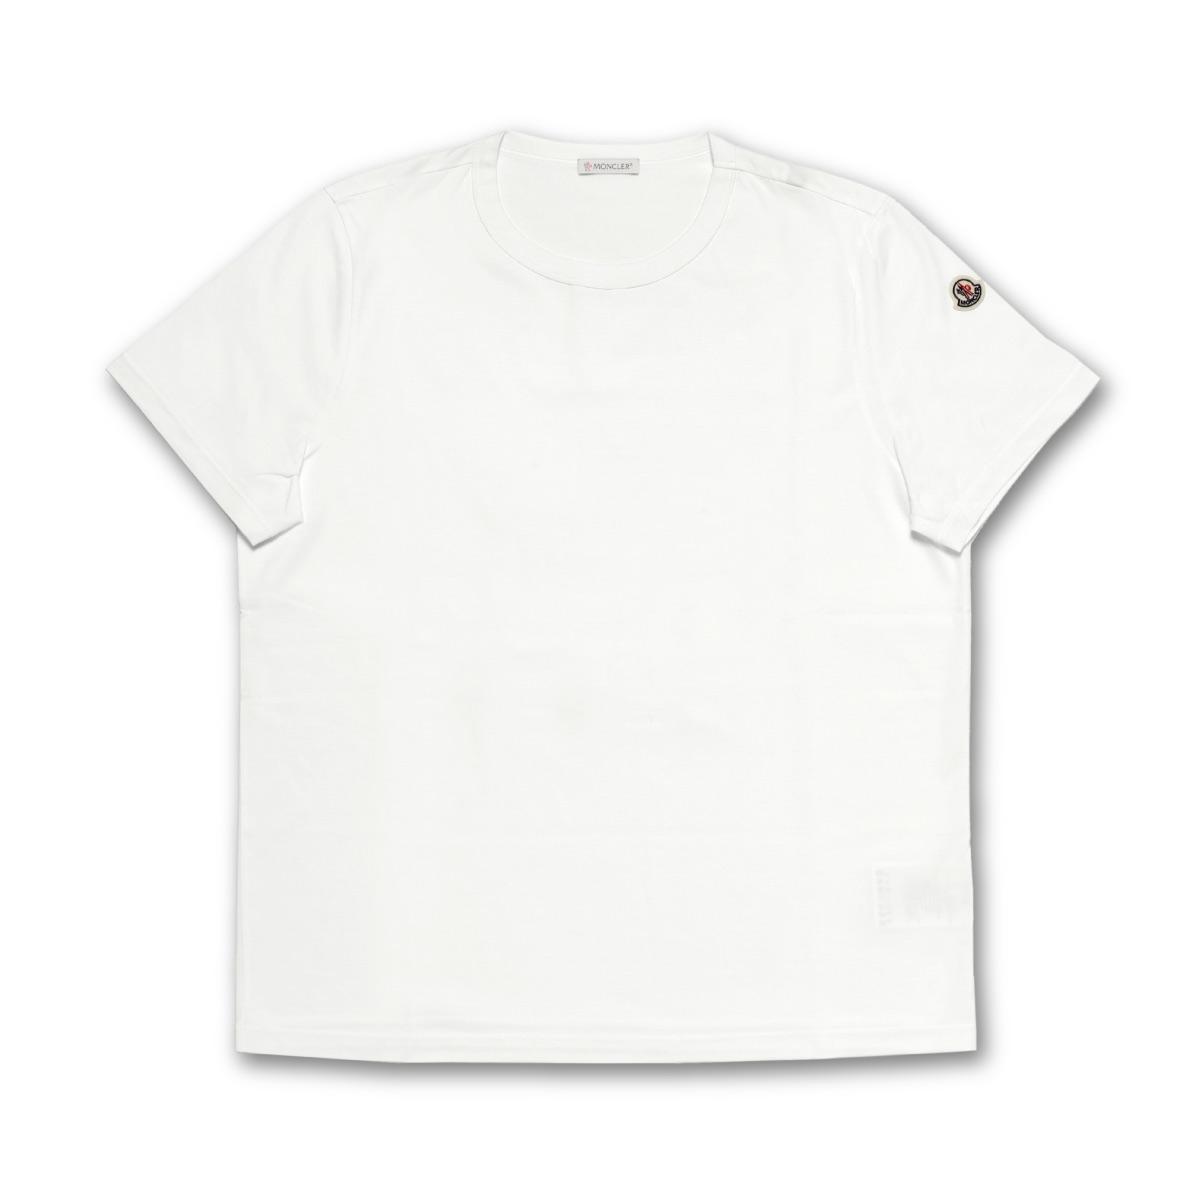 moncler white t shirt